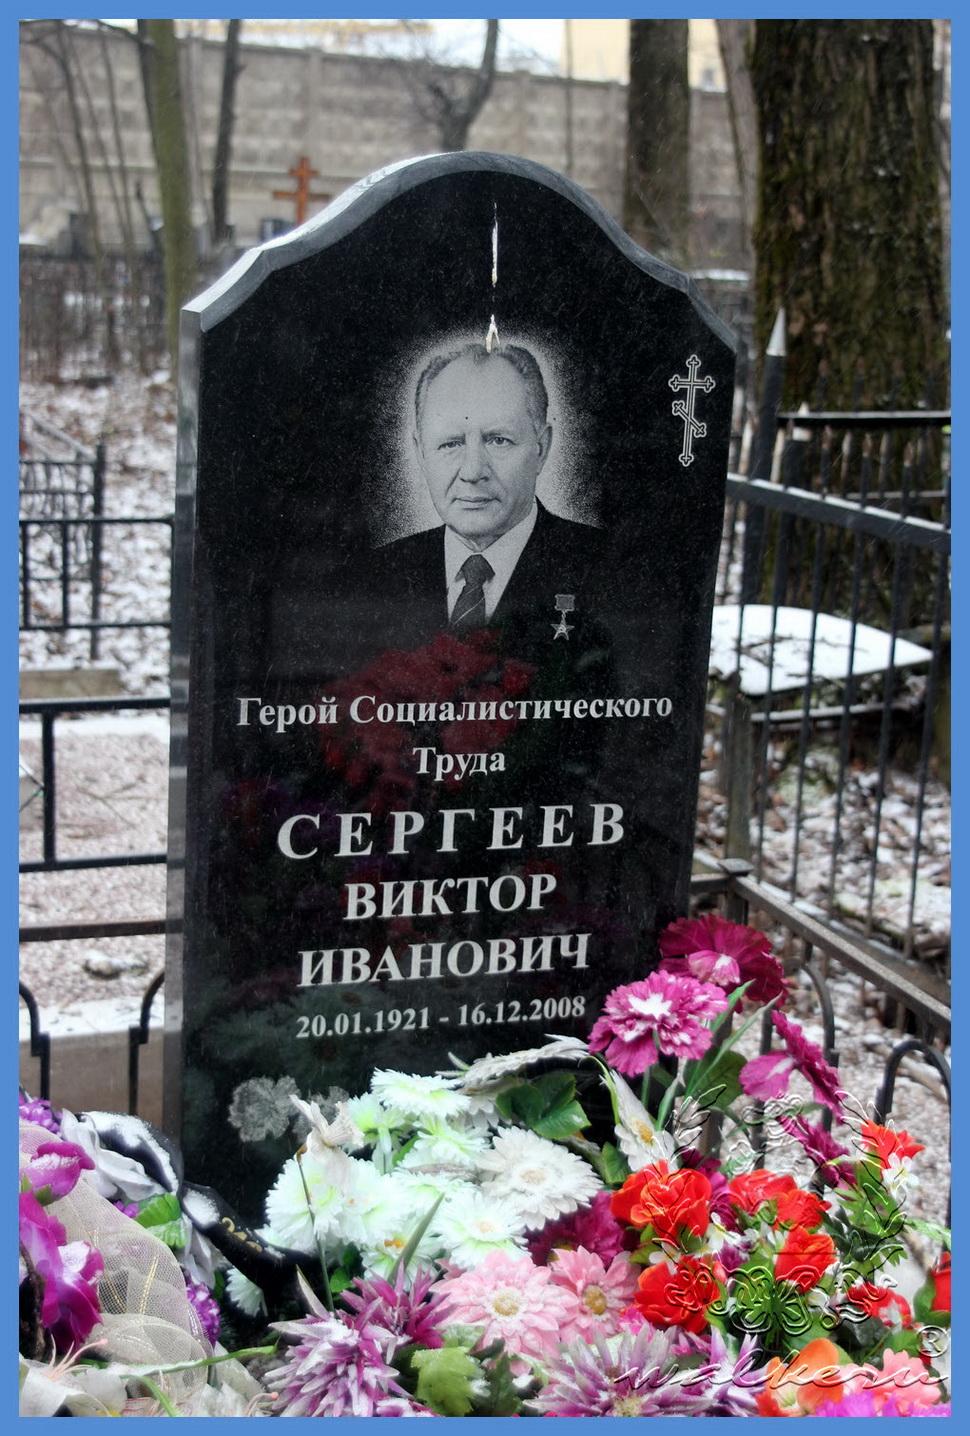 Сергеев Виктор Иванович